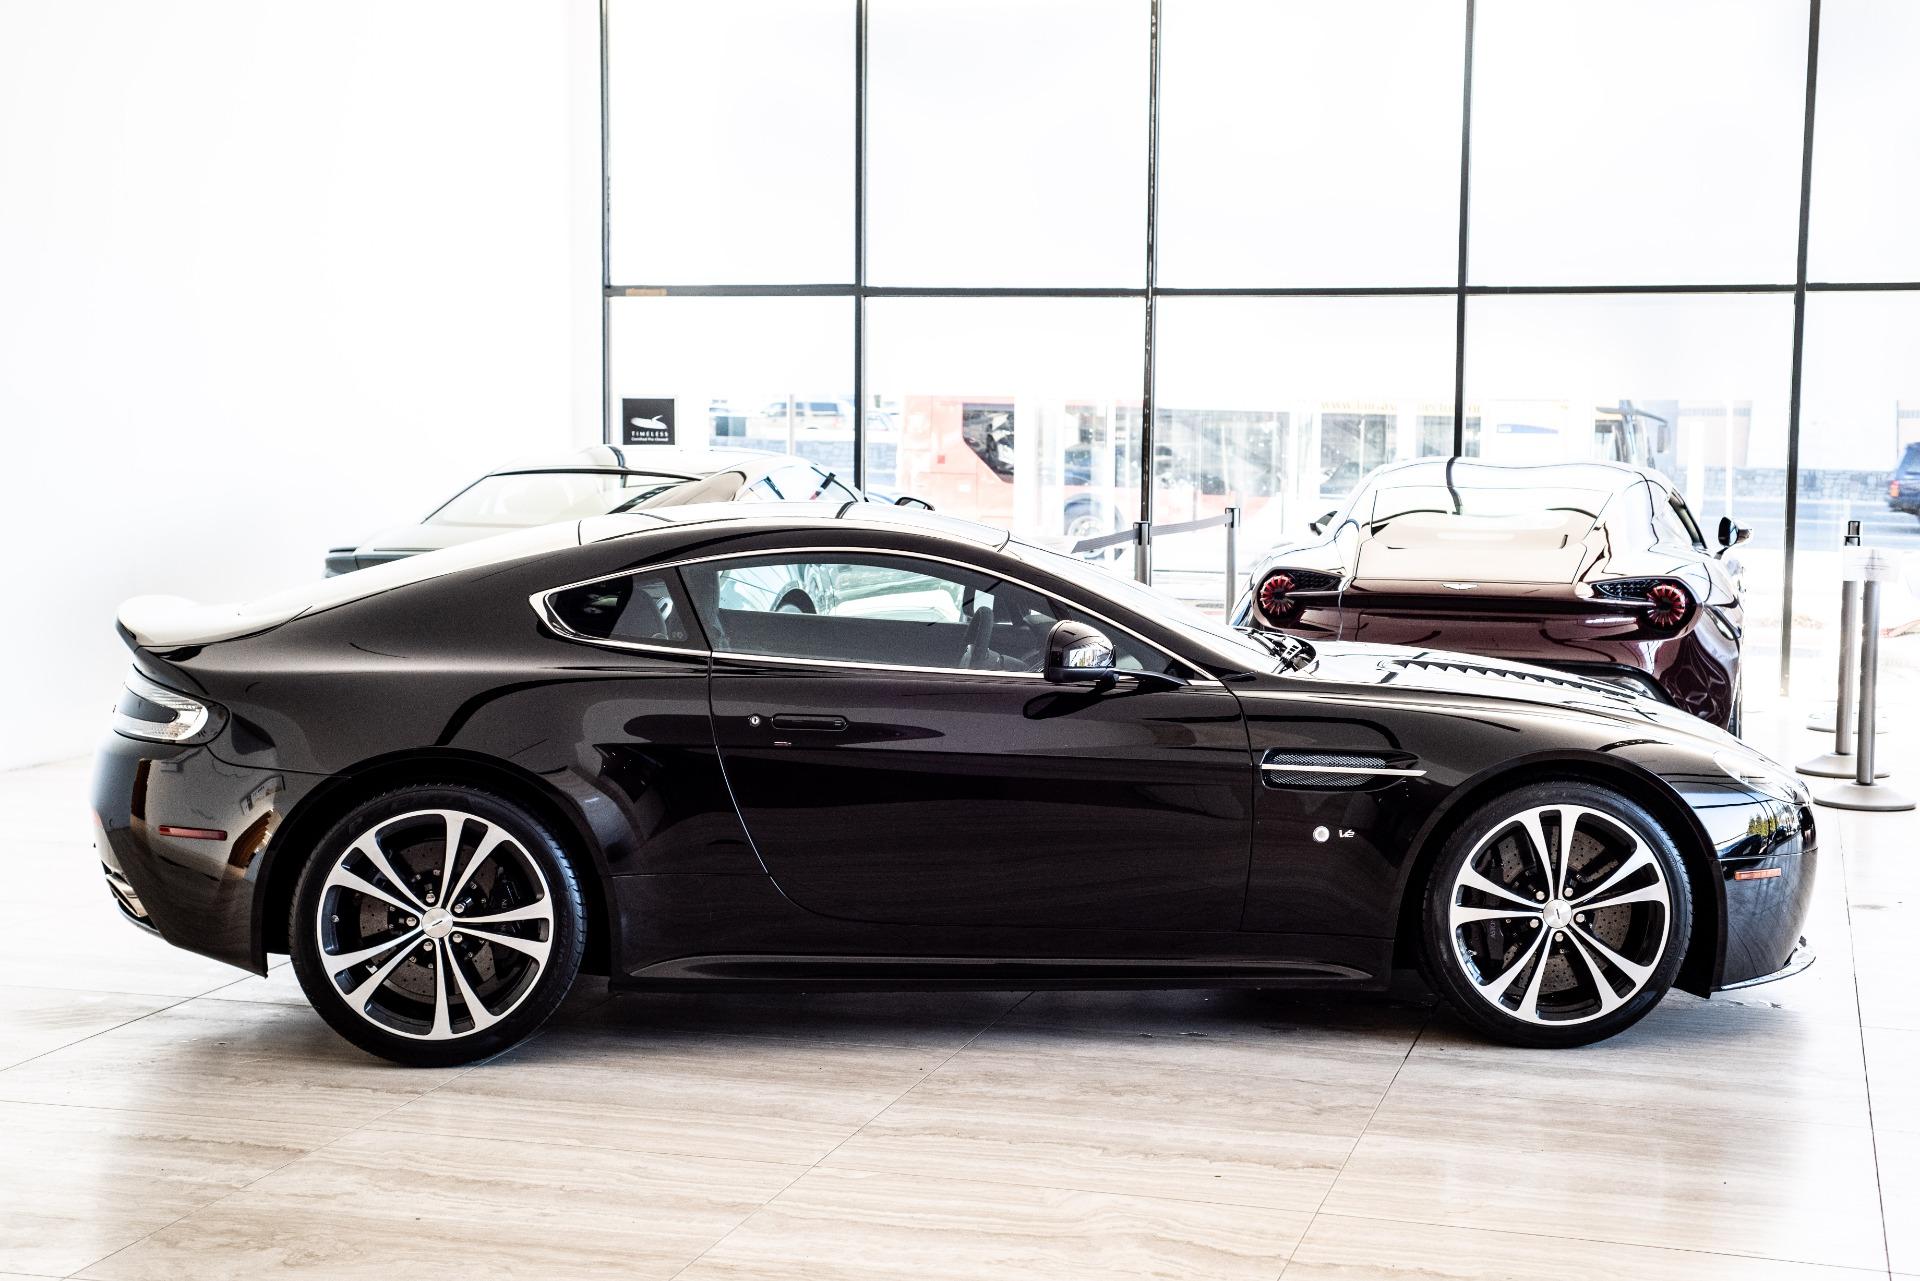 2015 Aston Martin V12 Vantage S Stock Ps01899 For Sale Near Vienna